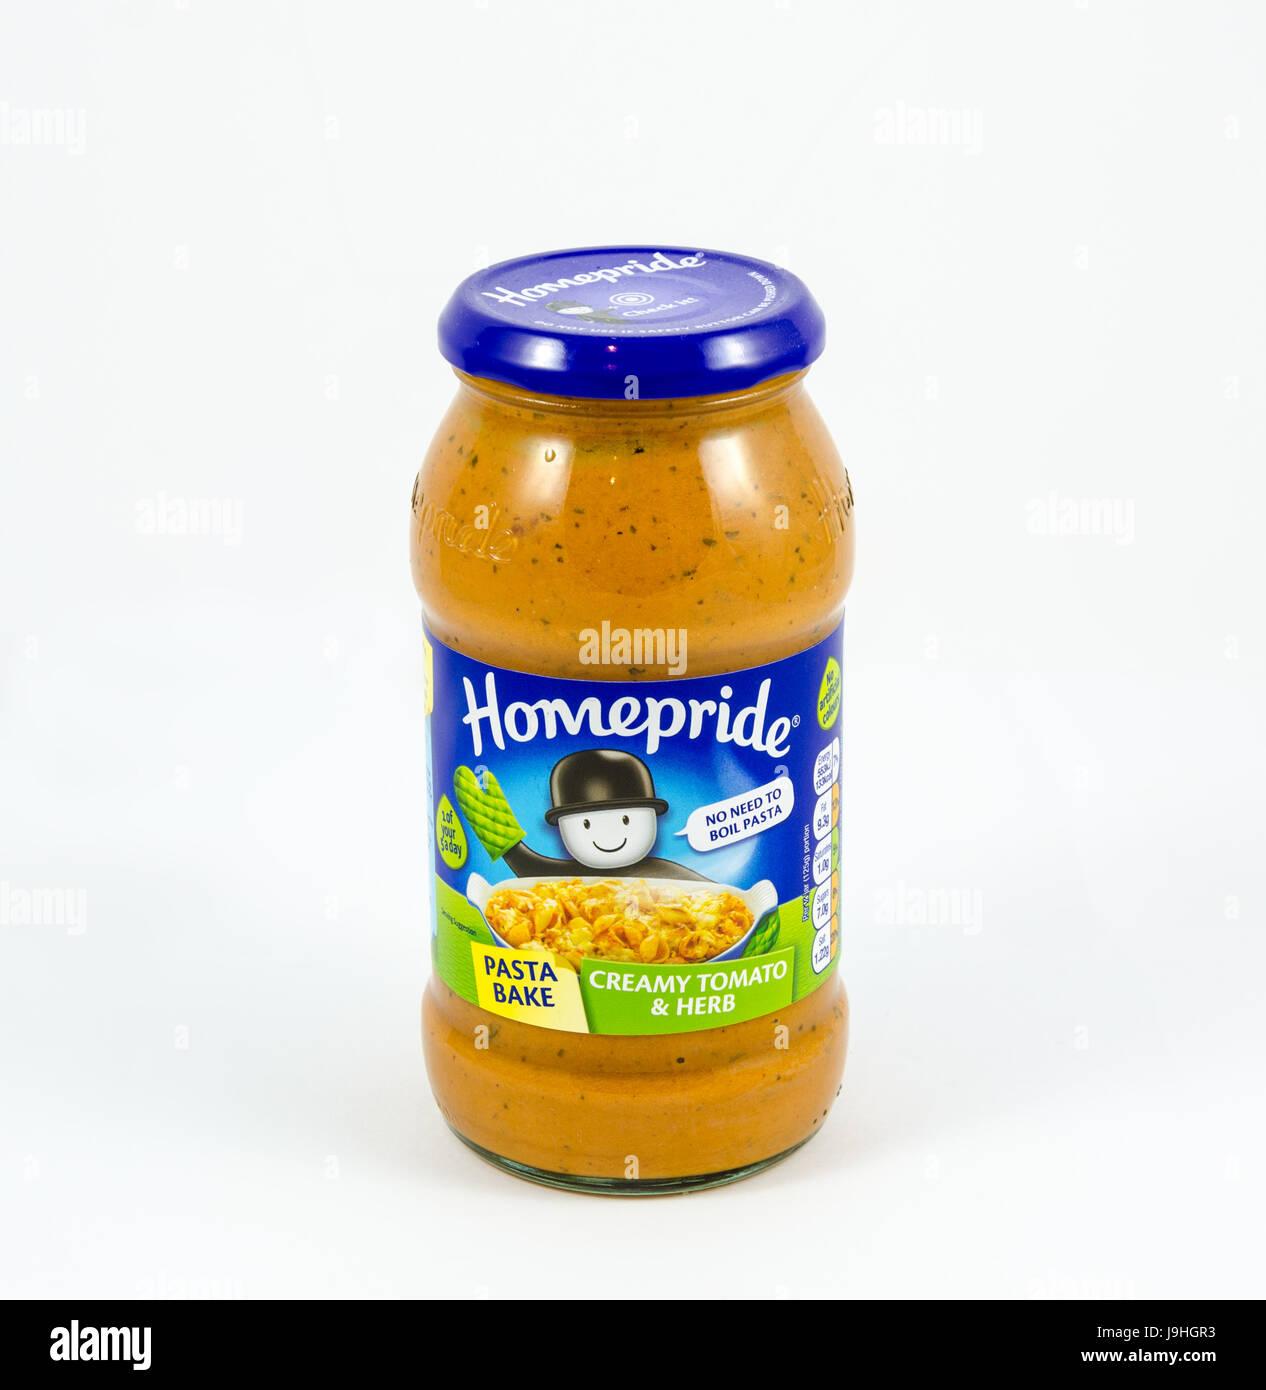 Homepride creamy tomat and herb pasta bake. - Stock Image